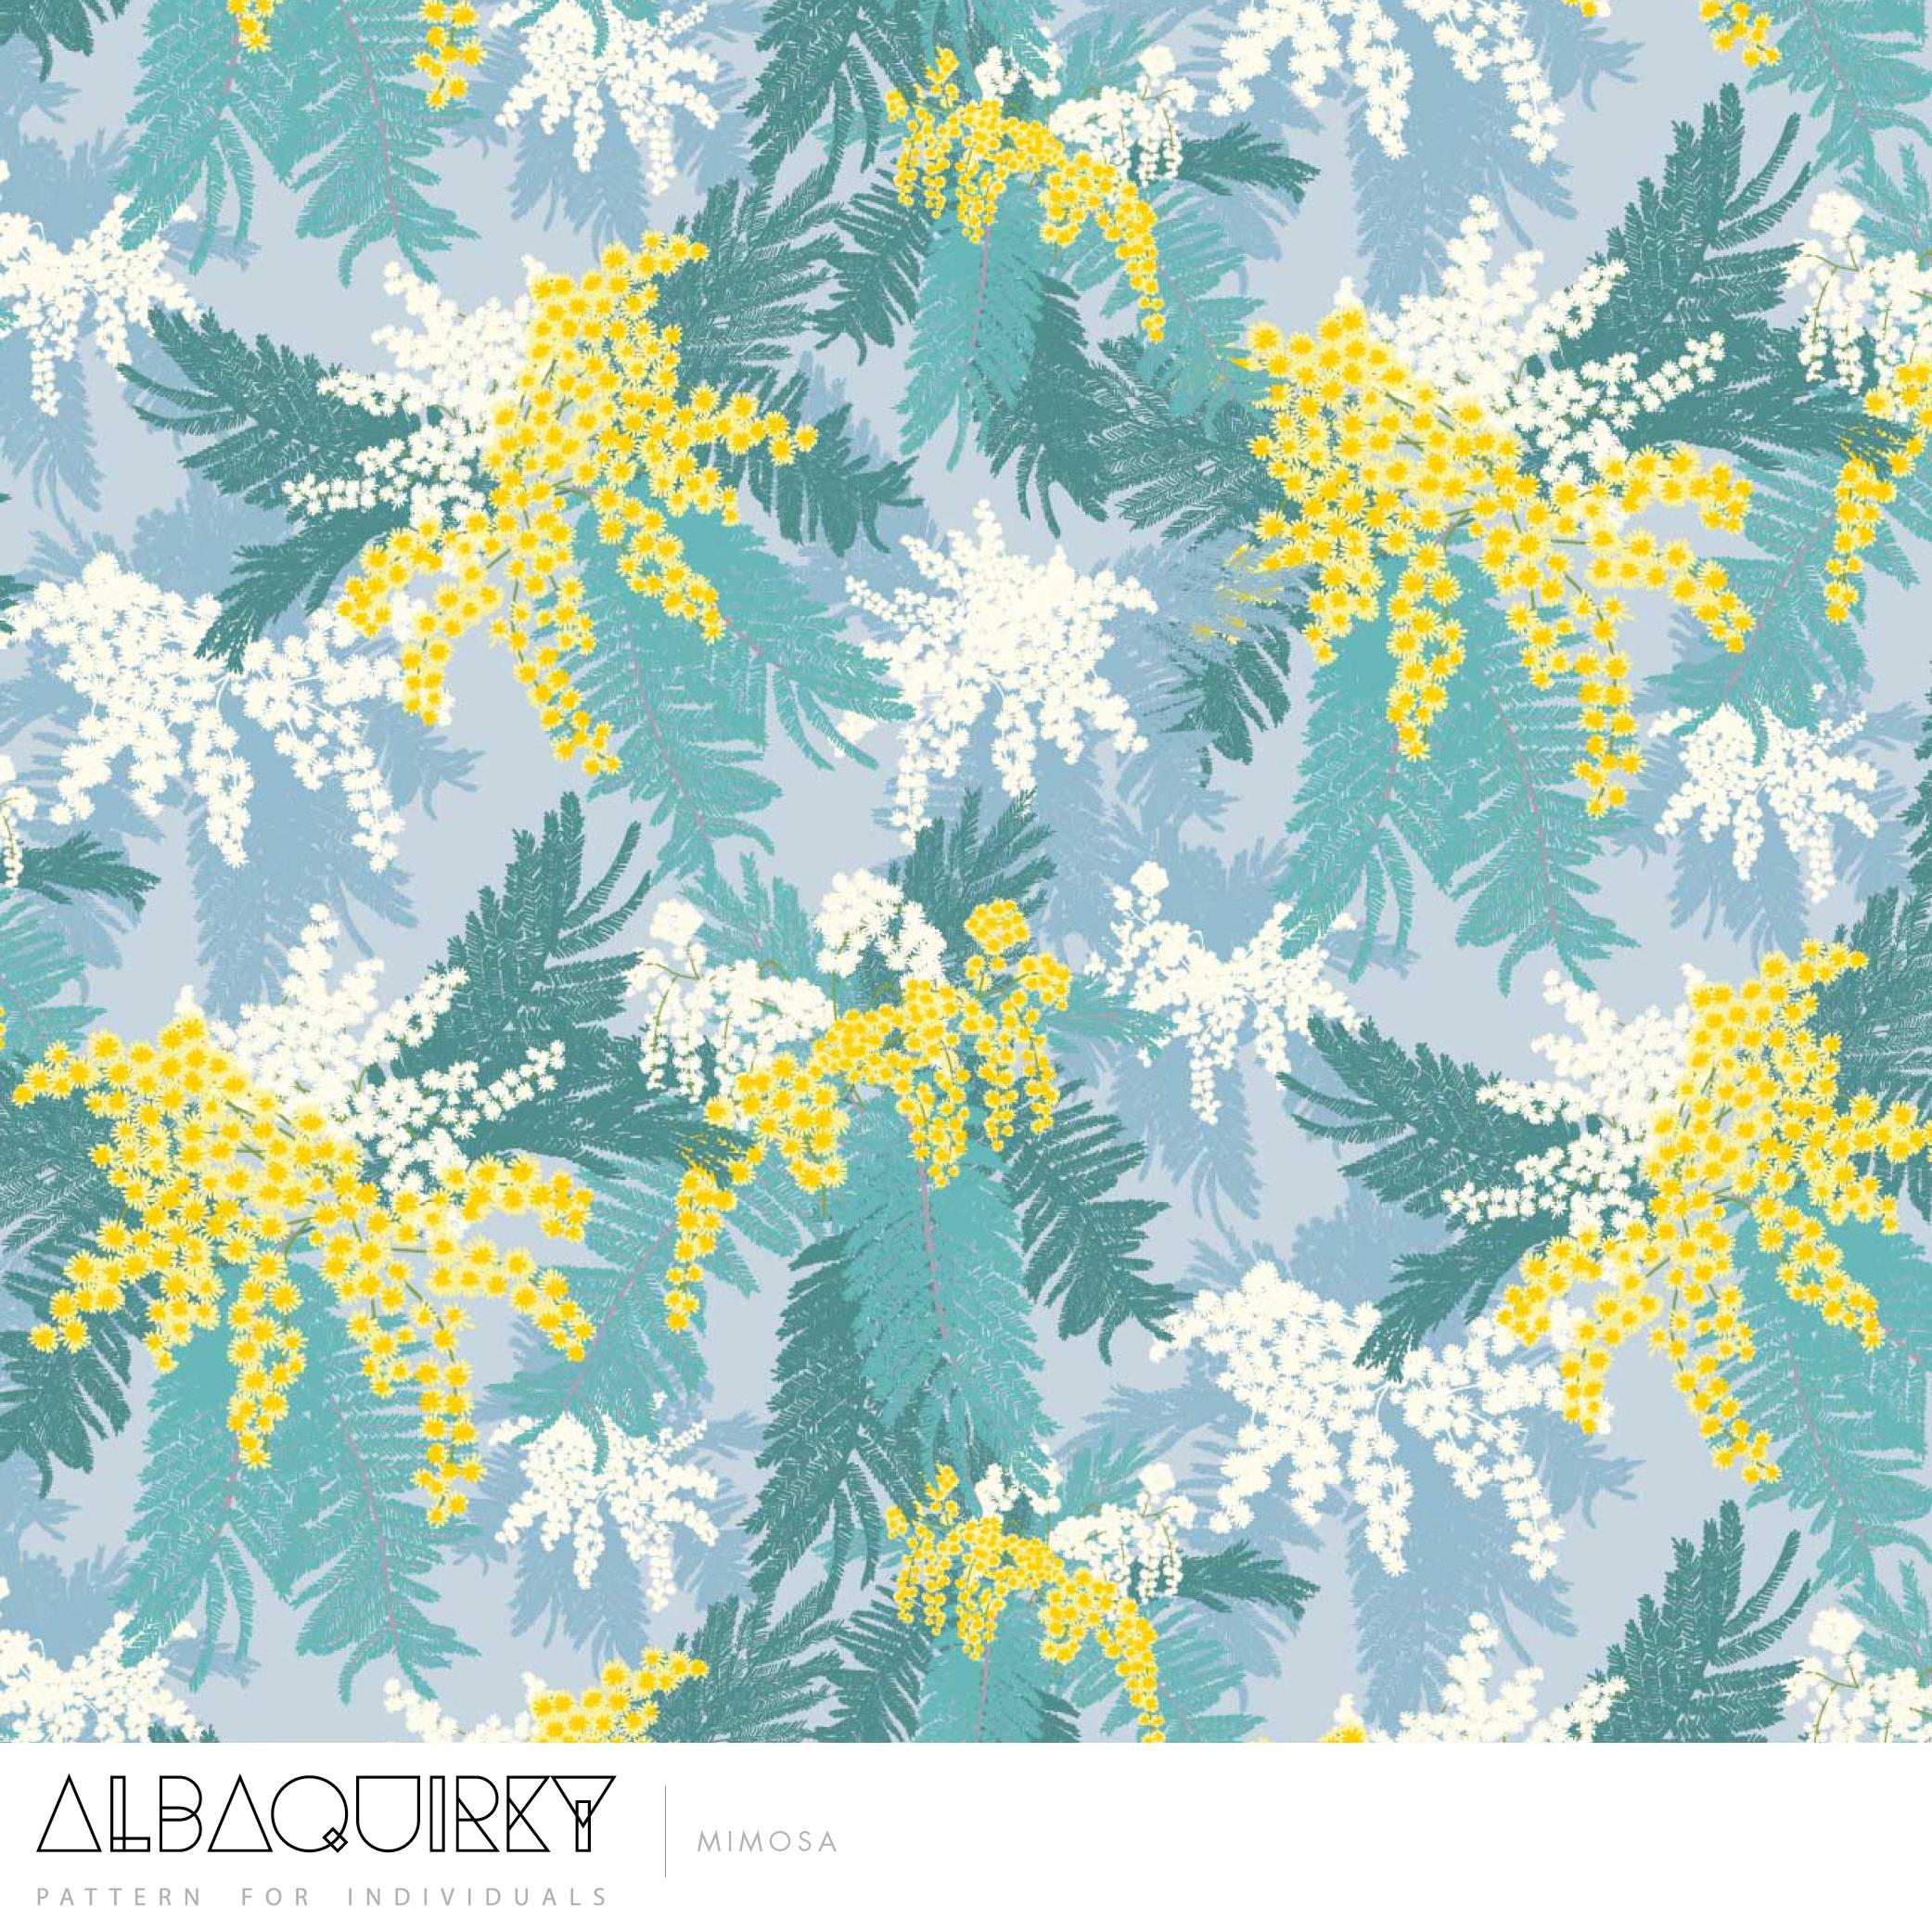 albaquirky_mimosa.jpg